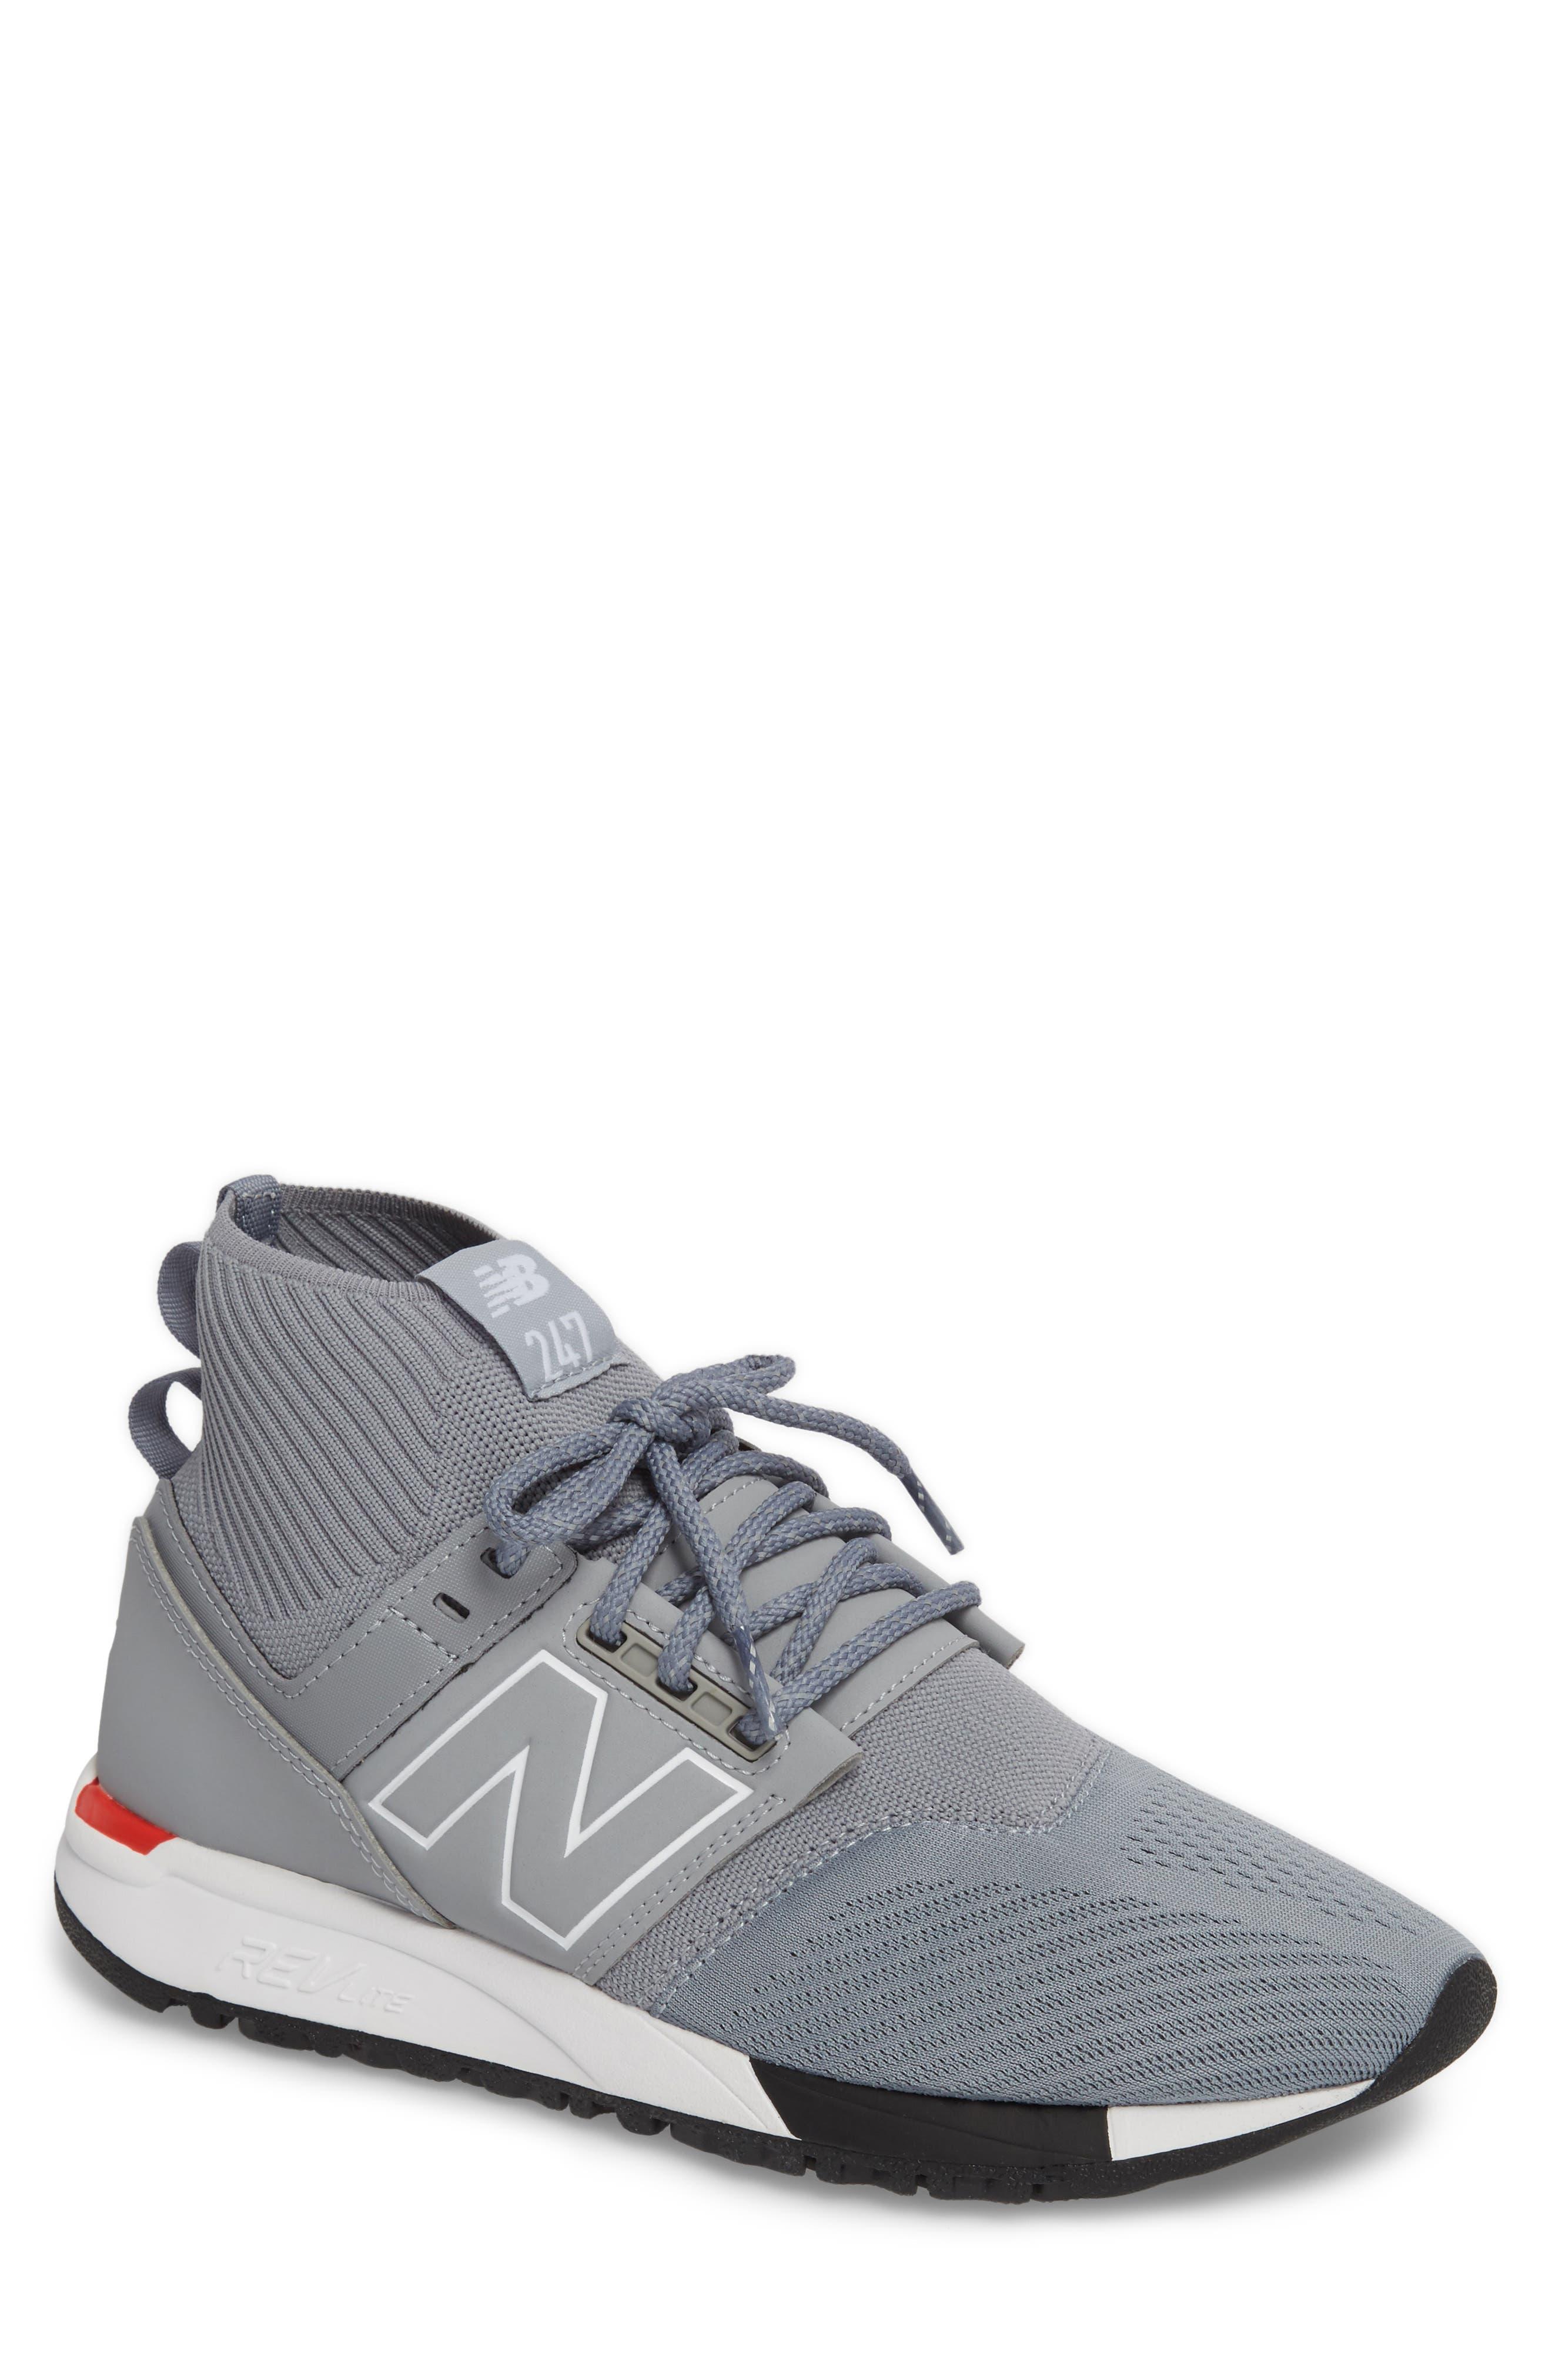 Alternate Image 1 Selected - New Balance 247 Mid Sneaker (Men)